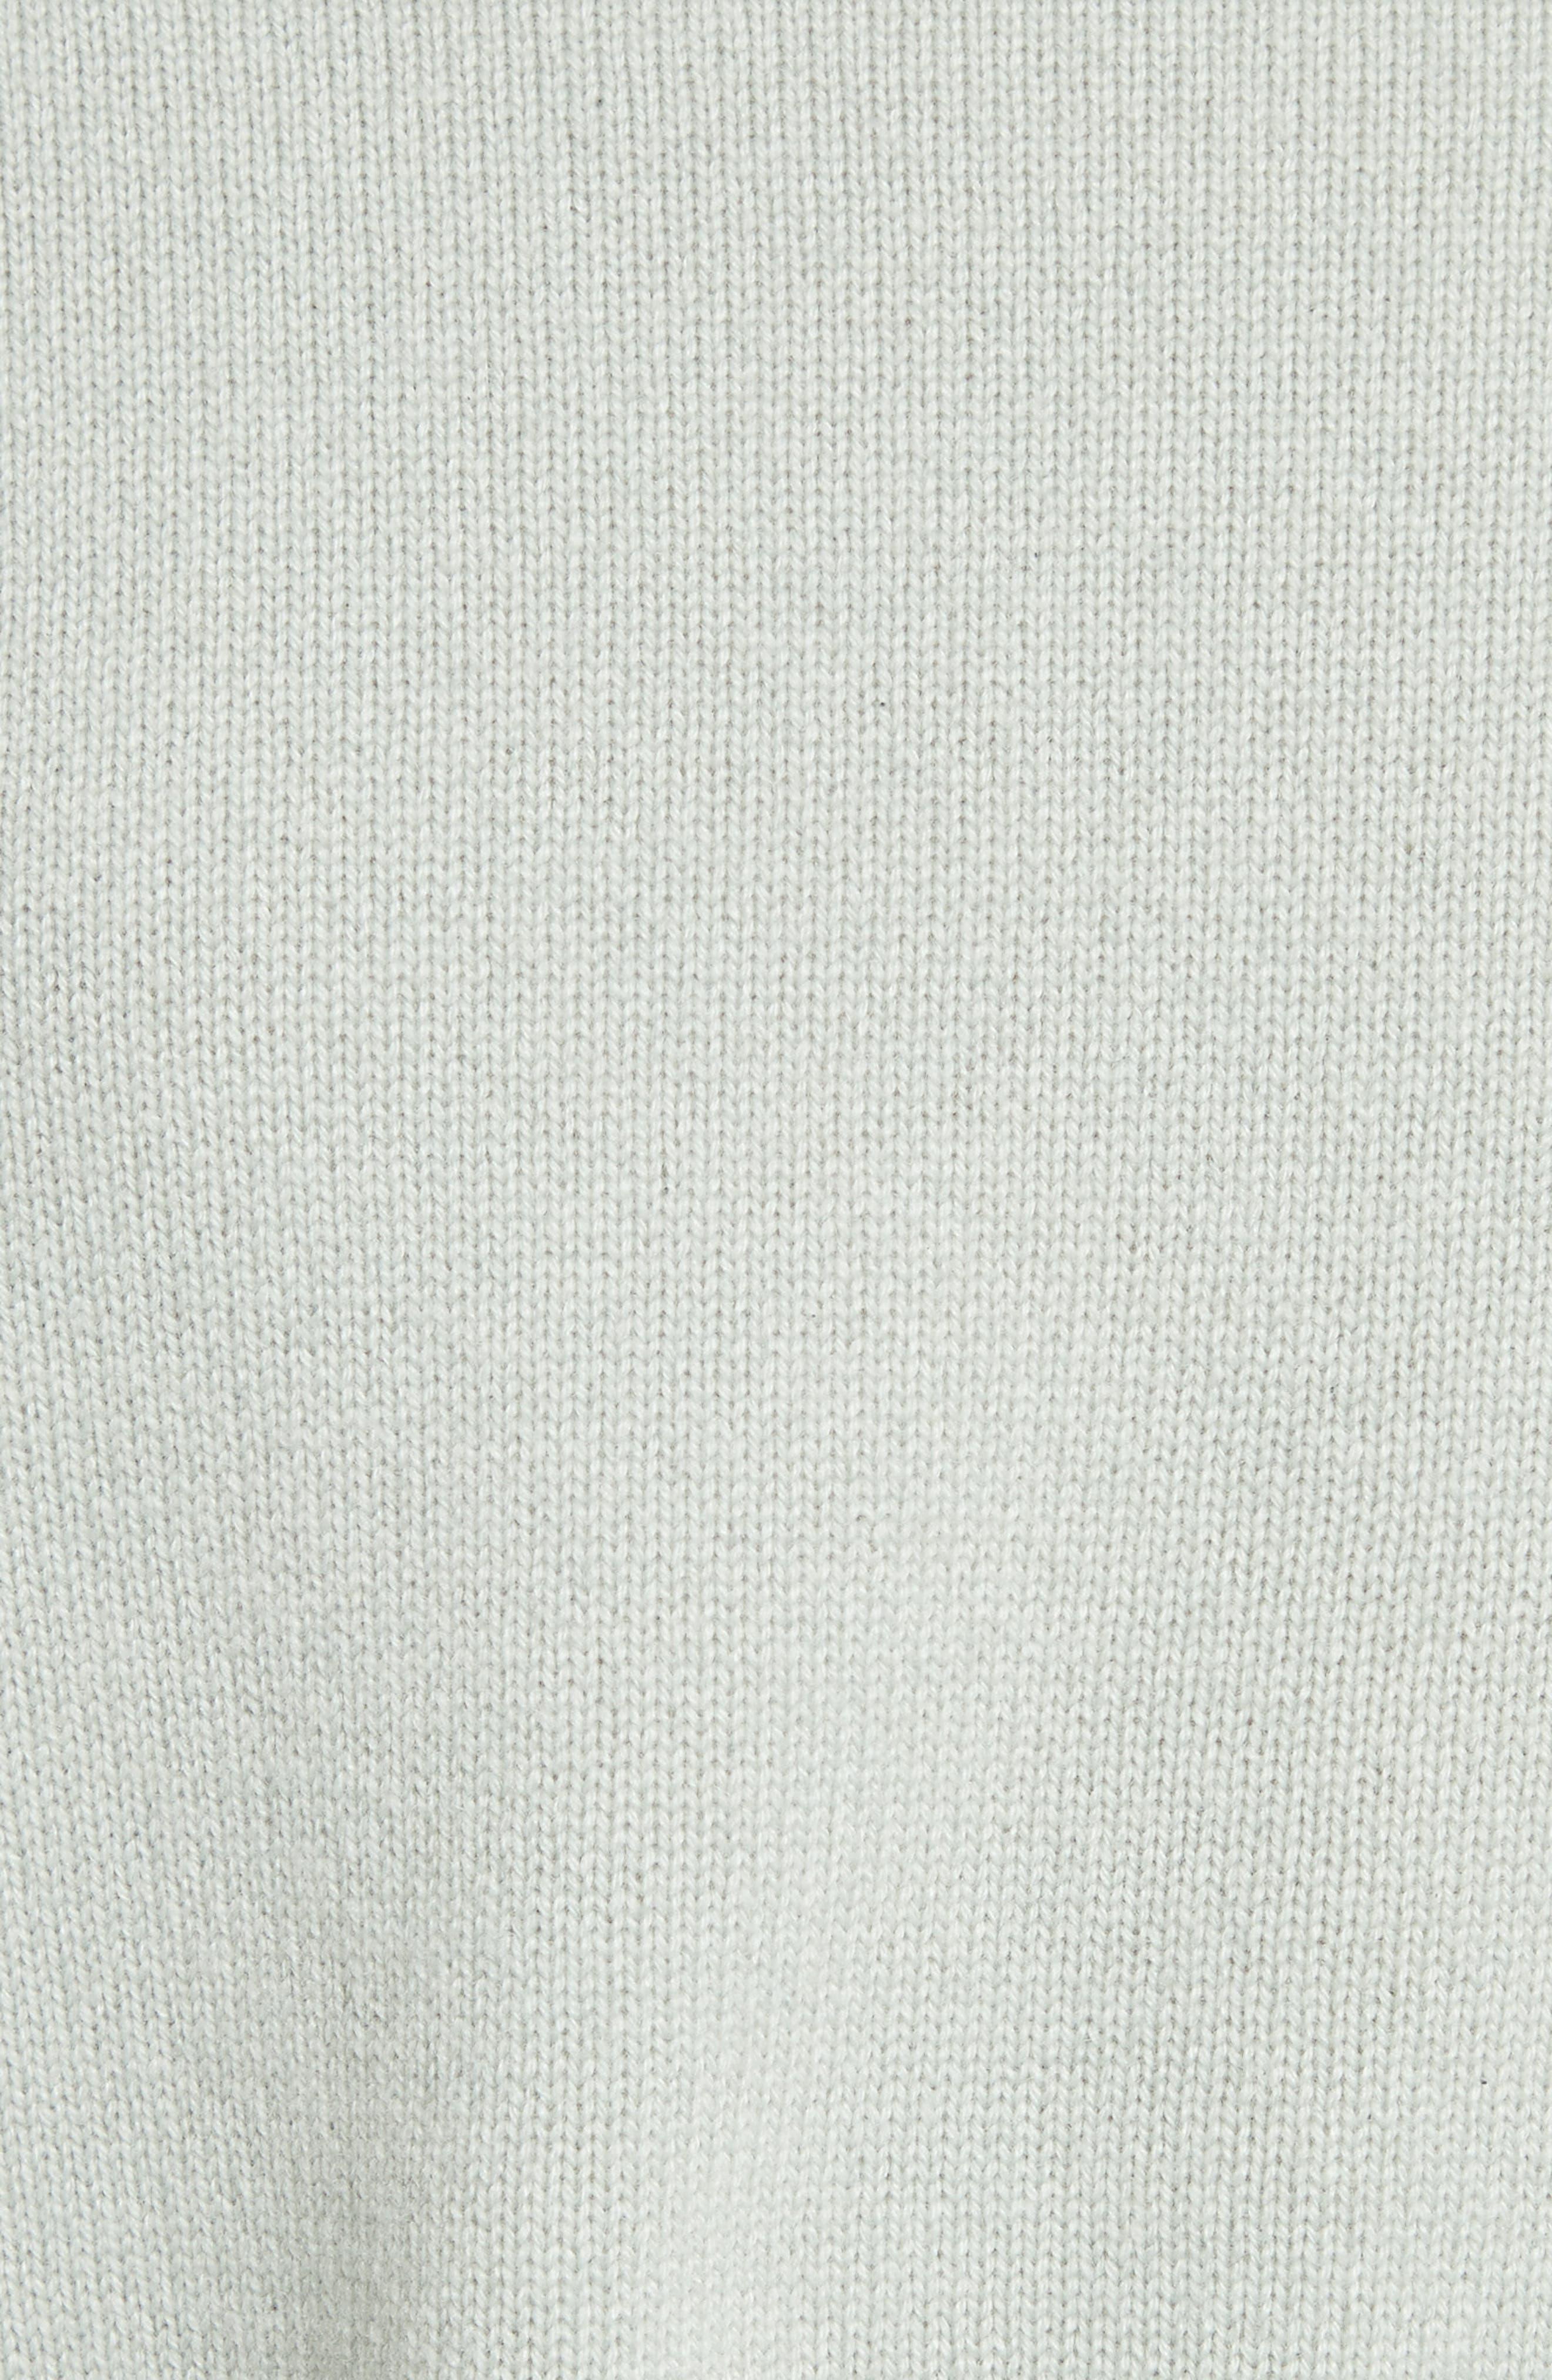 Boat Neck Cashmere Sweater,                             Alternate thumbnail 5, color,                             Light Winter Green